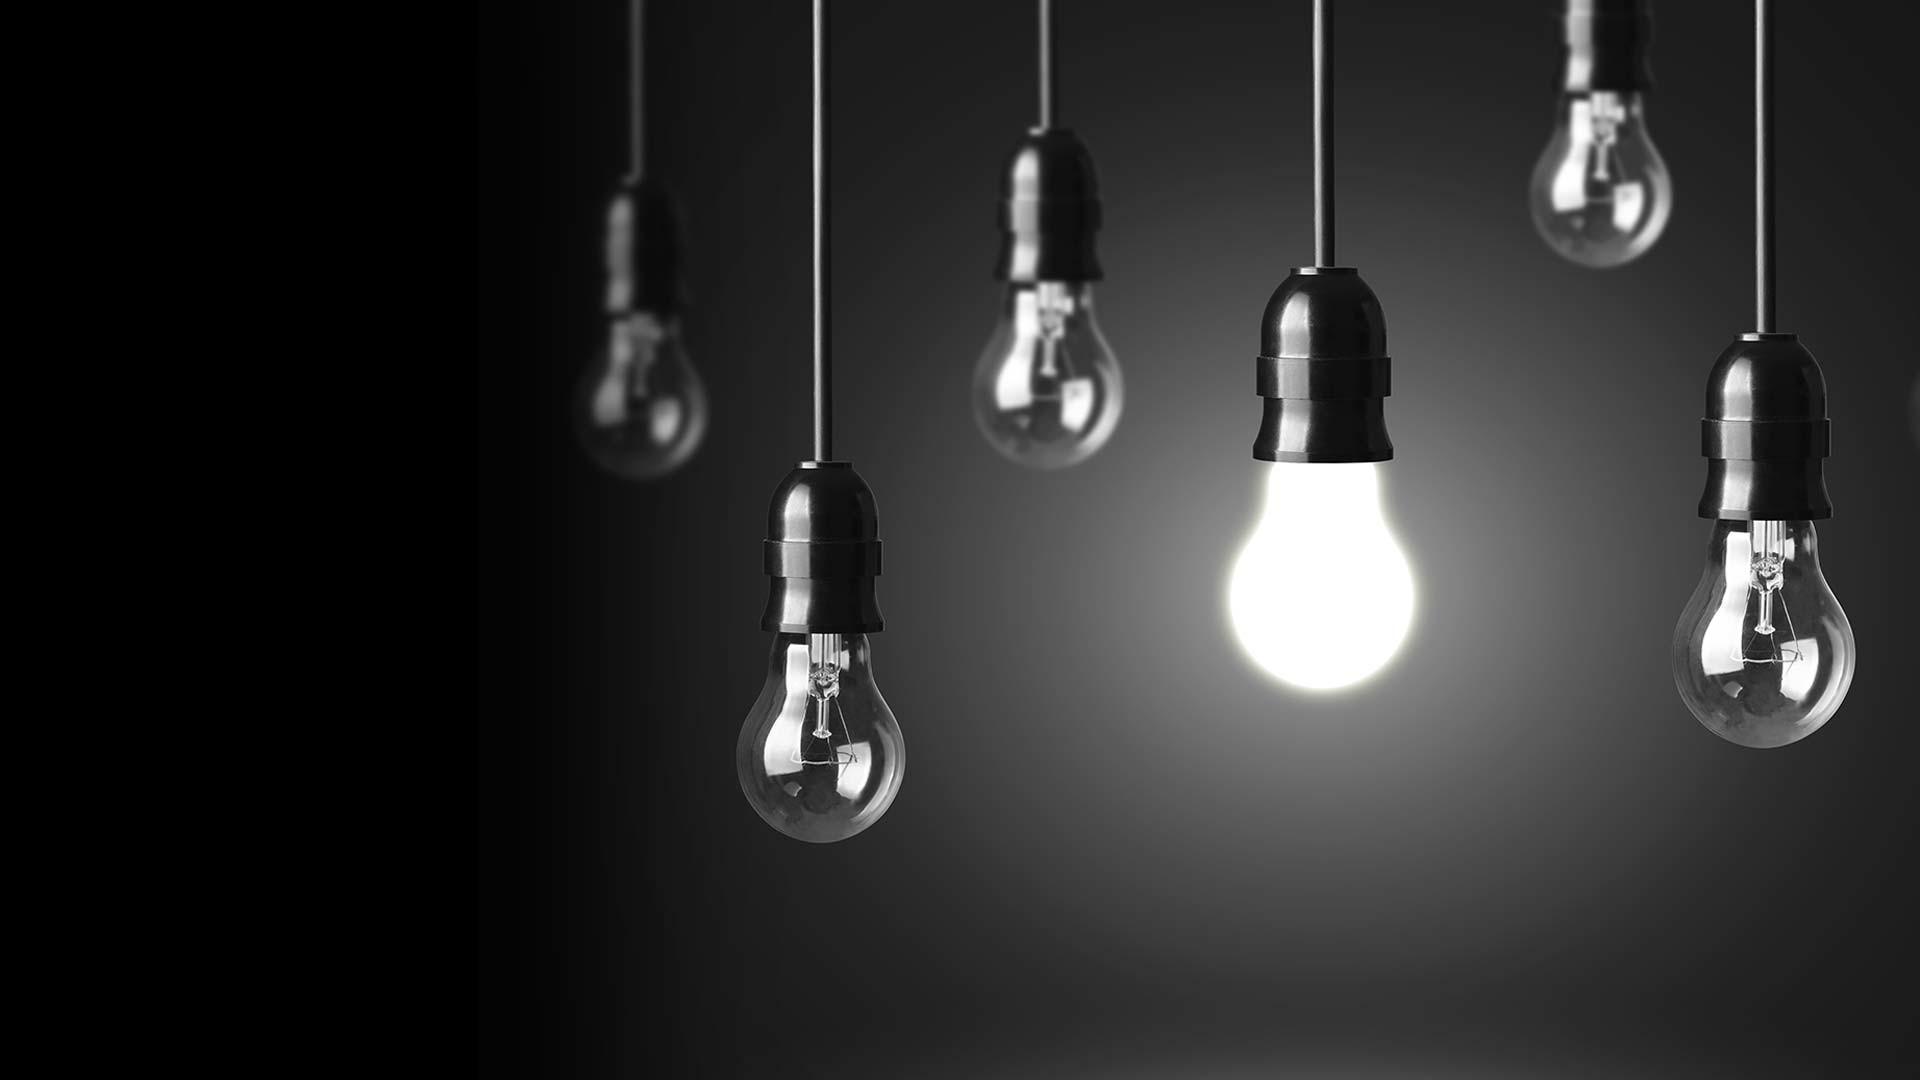 Bulbs Data Src Light Bulb Hd Wallpapers For Mobile Broken Hanging Light Bulb 1920x1080 Download Hd Wallpaper Wallpapertip